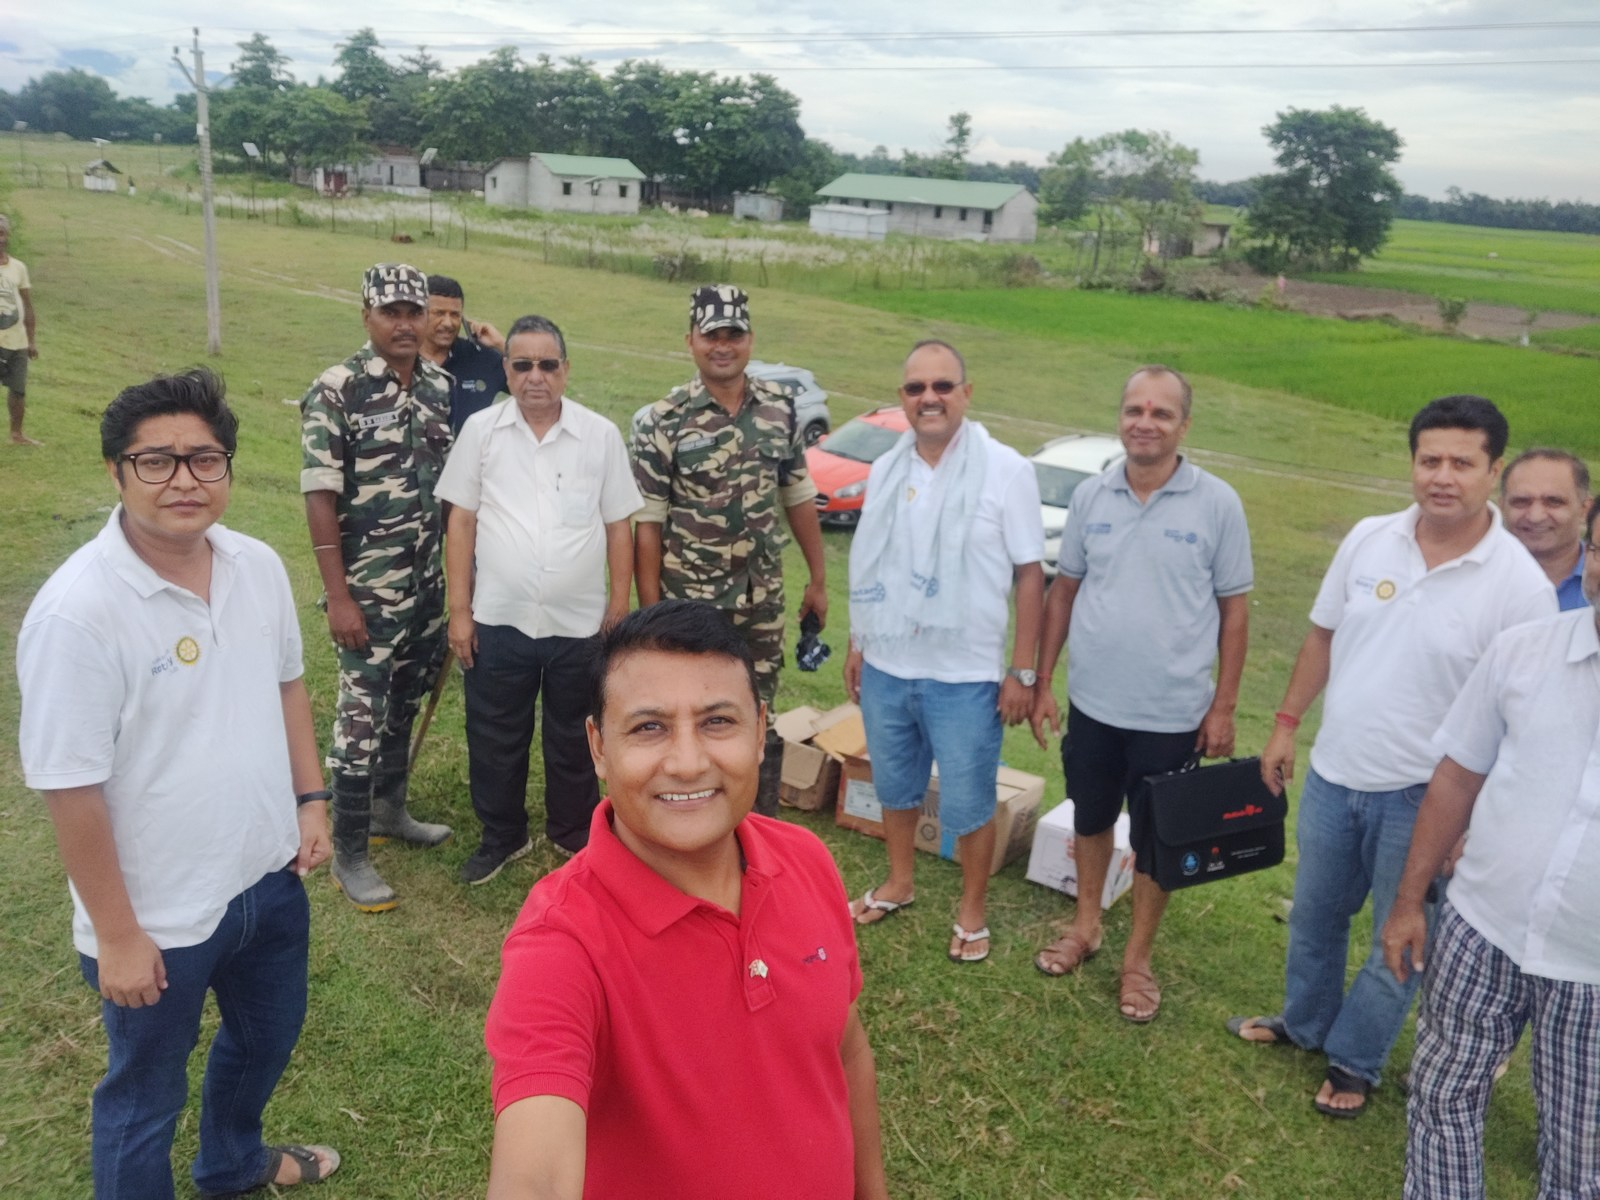 Free-Health-Camp-Eye-Screening-at-Gwala-Basti-Mechinagar-15-Jhapa-Nepal-Rotary-Club-of-Kakarvitta-2